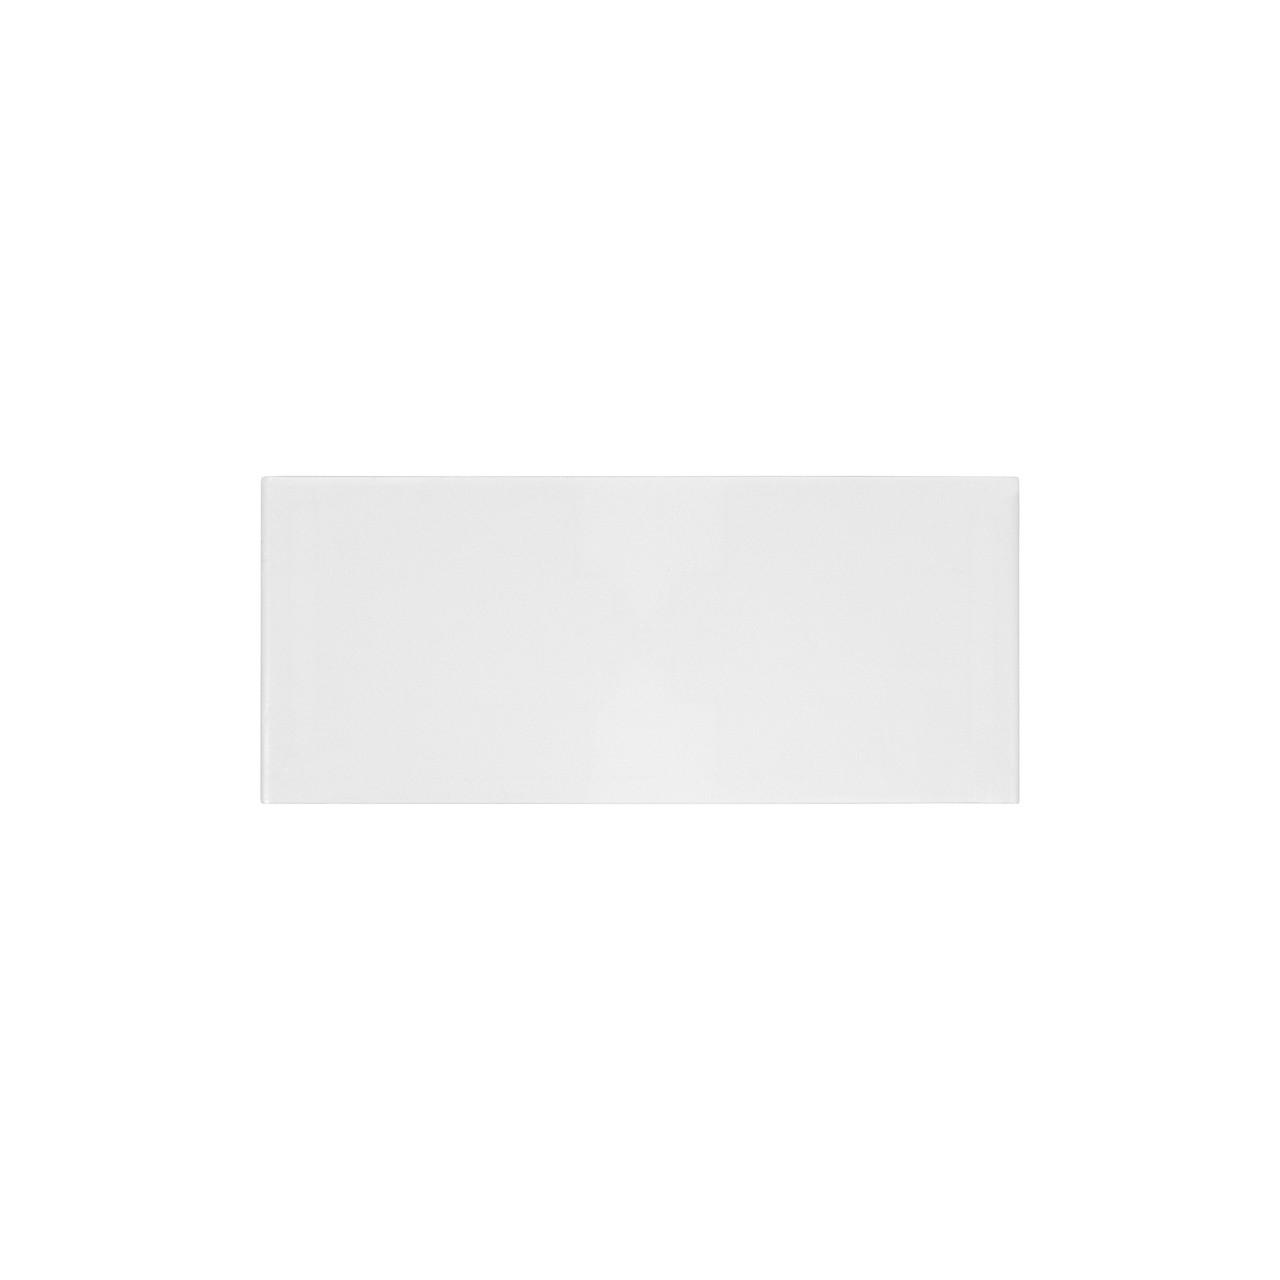 Vulcan RFID Printable Metal Mount Label - 100 Tags (98 x 42 mm) [Clearance]